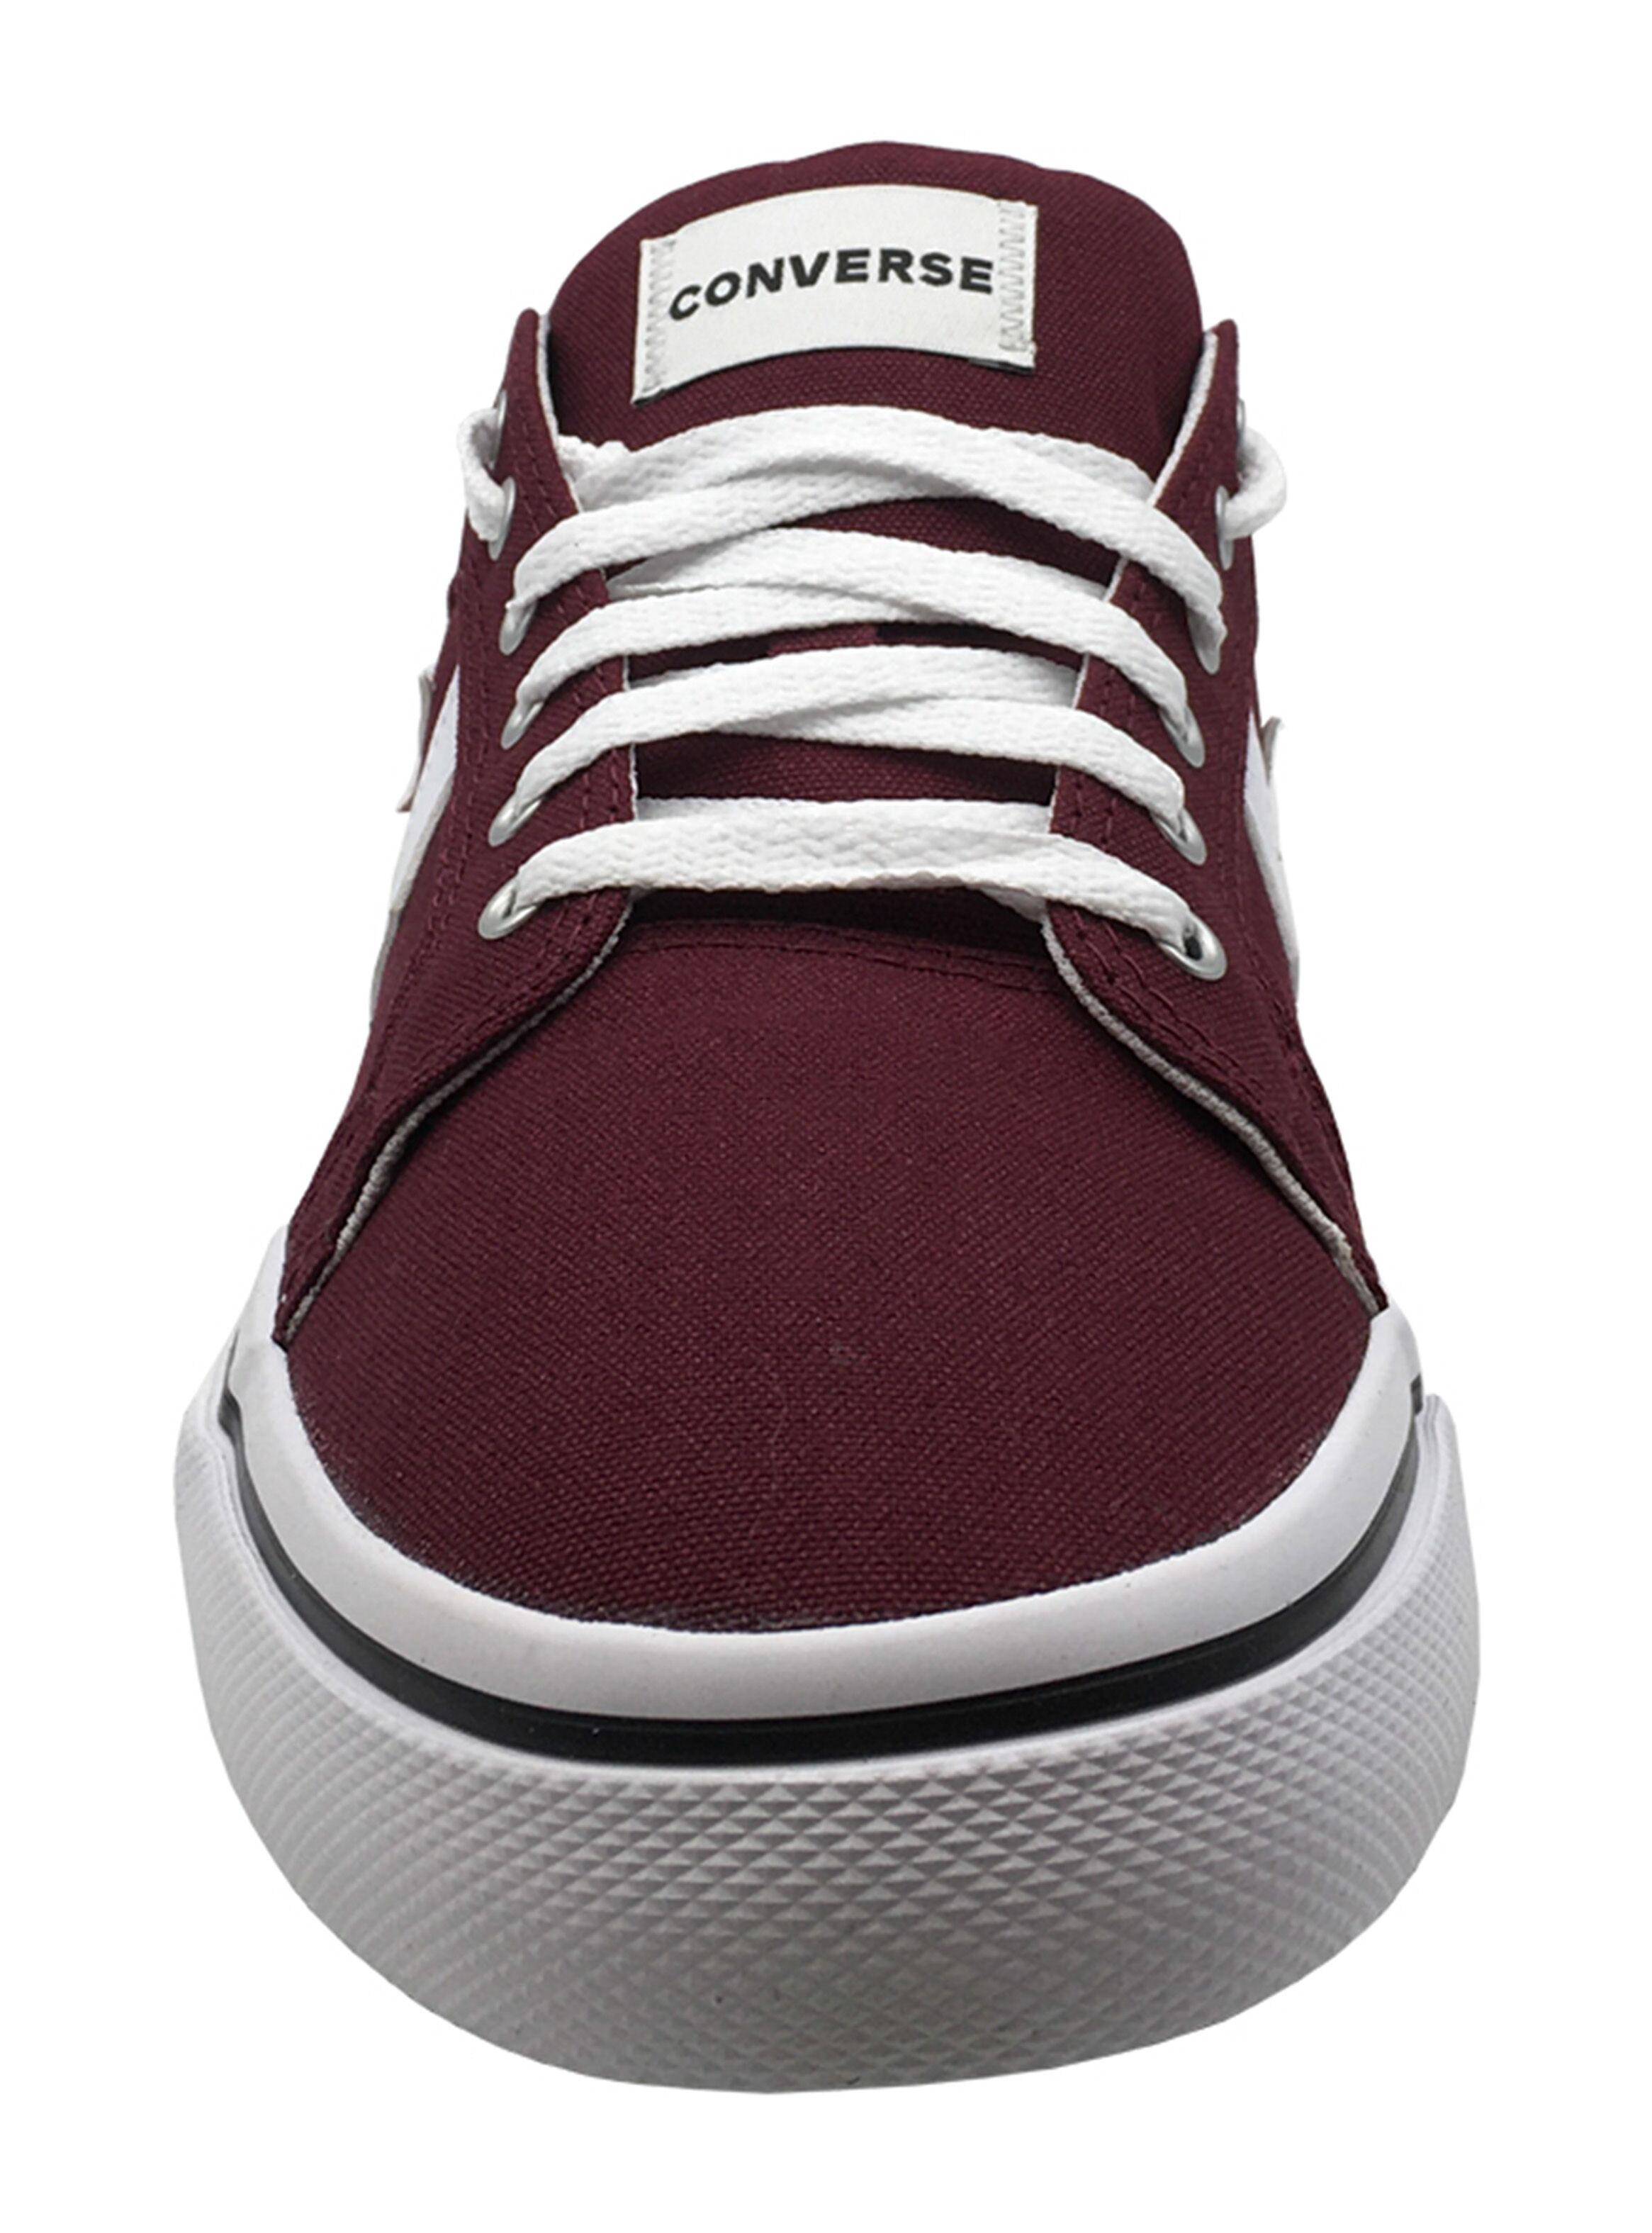 converse zapatillas skate